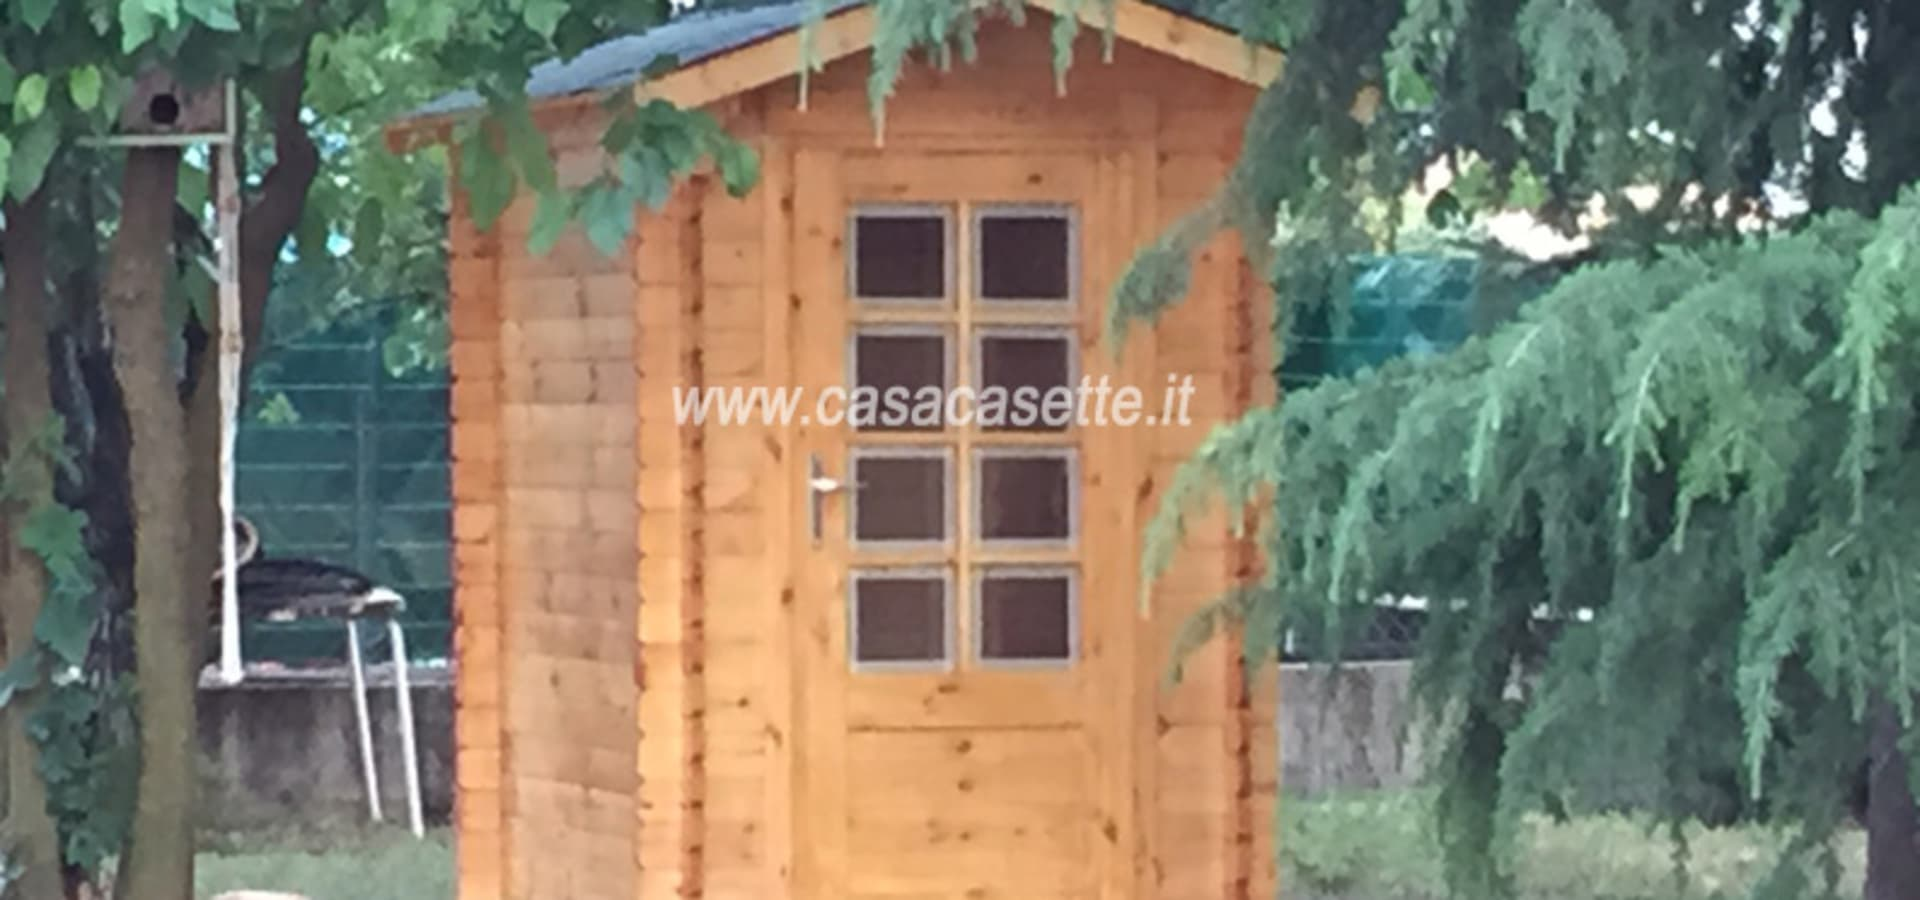 Casa Casette